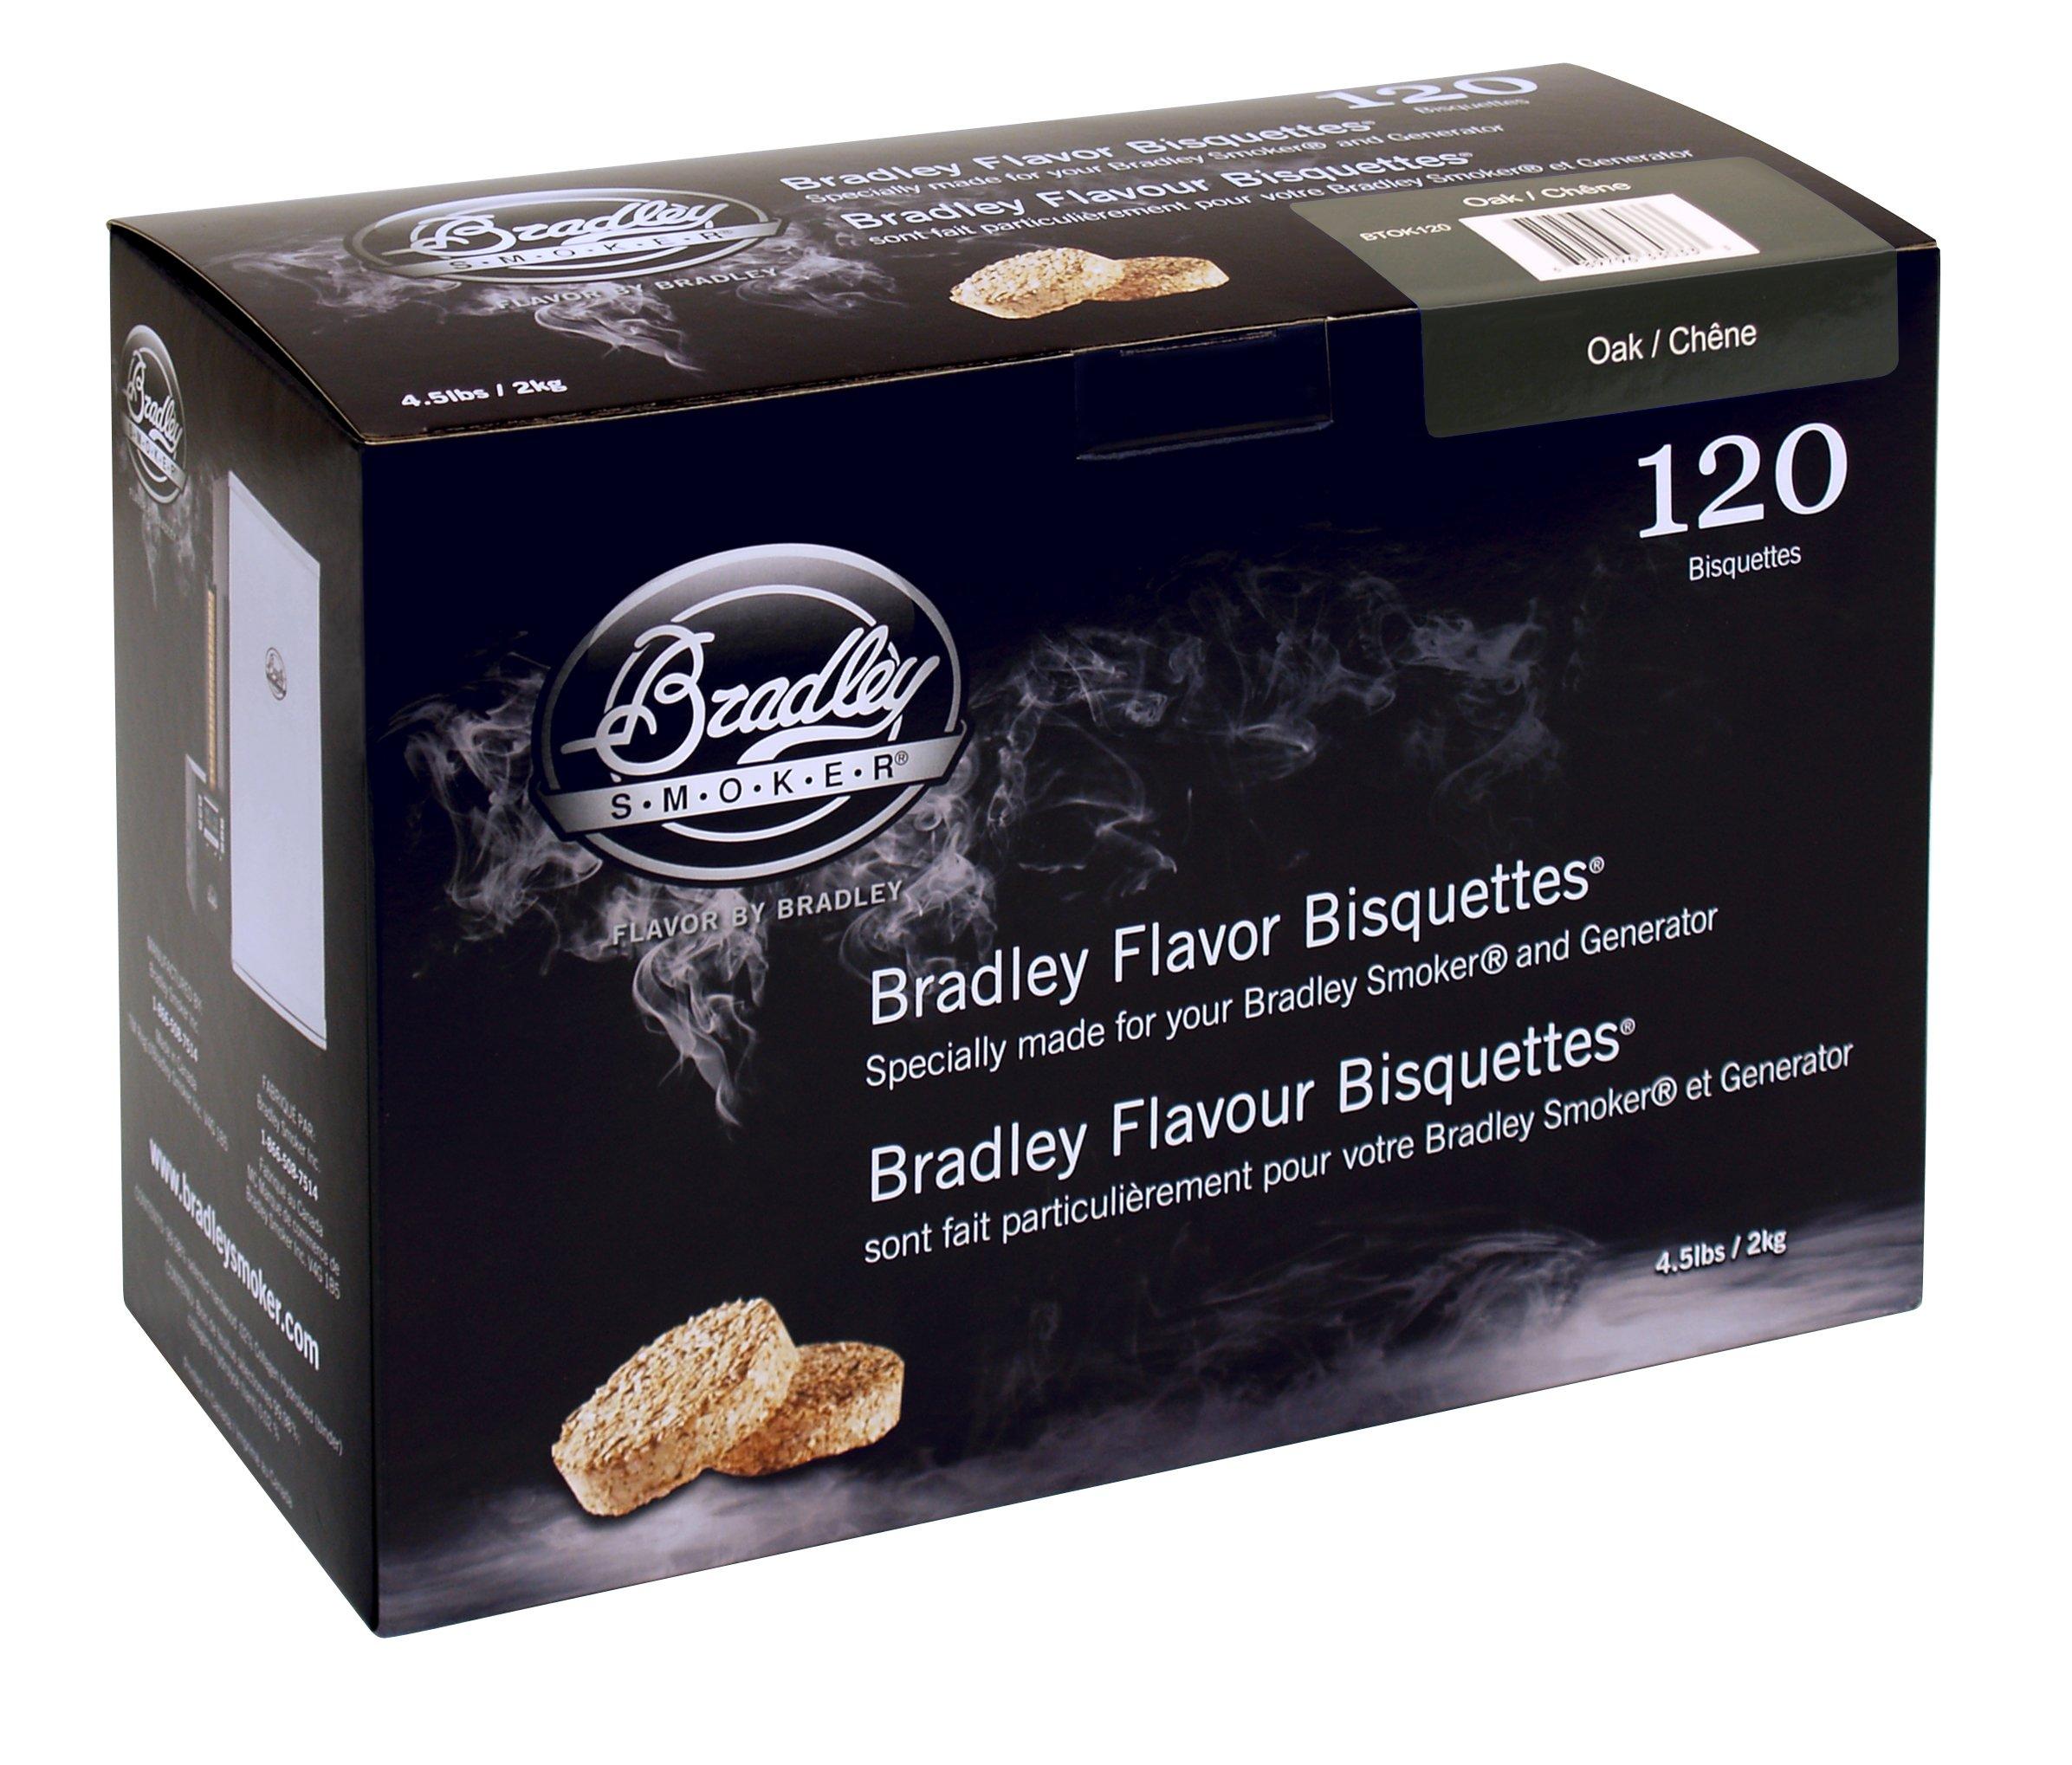 Bradley Smoker BTOK120 Oak Bisquettes 120 pack by Bradley Smoker